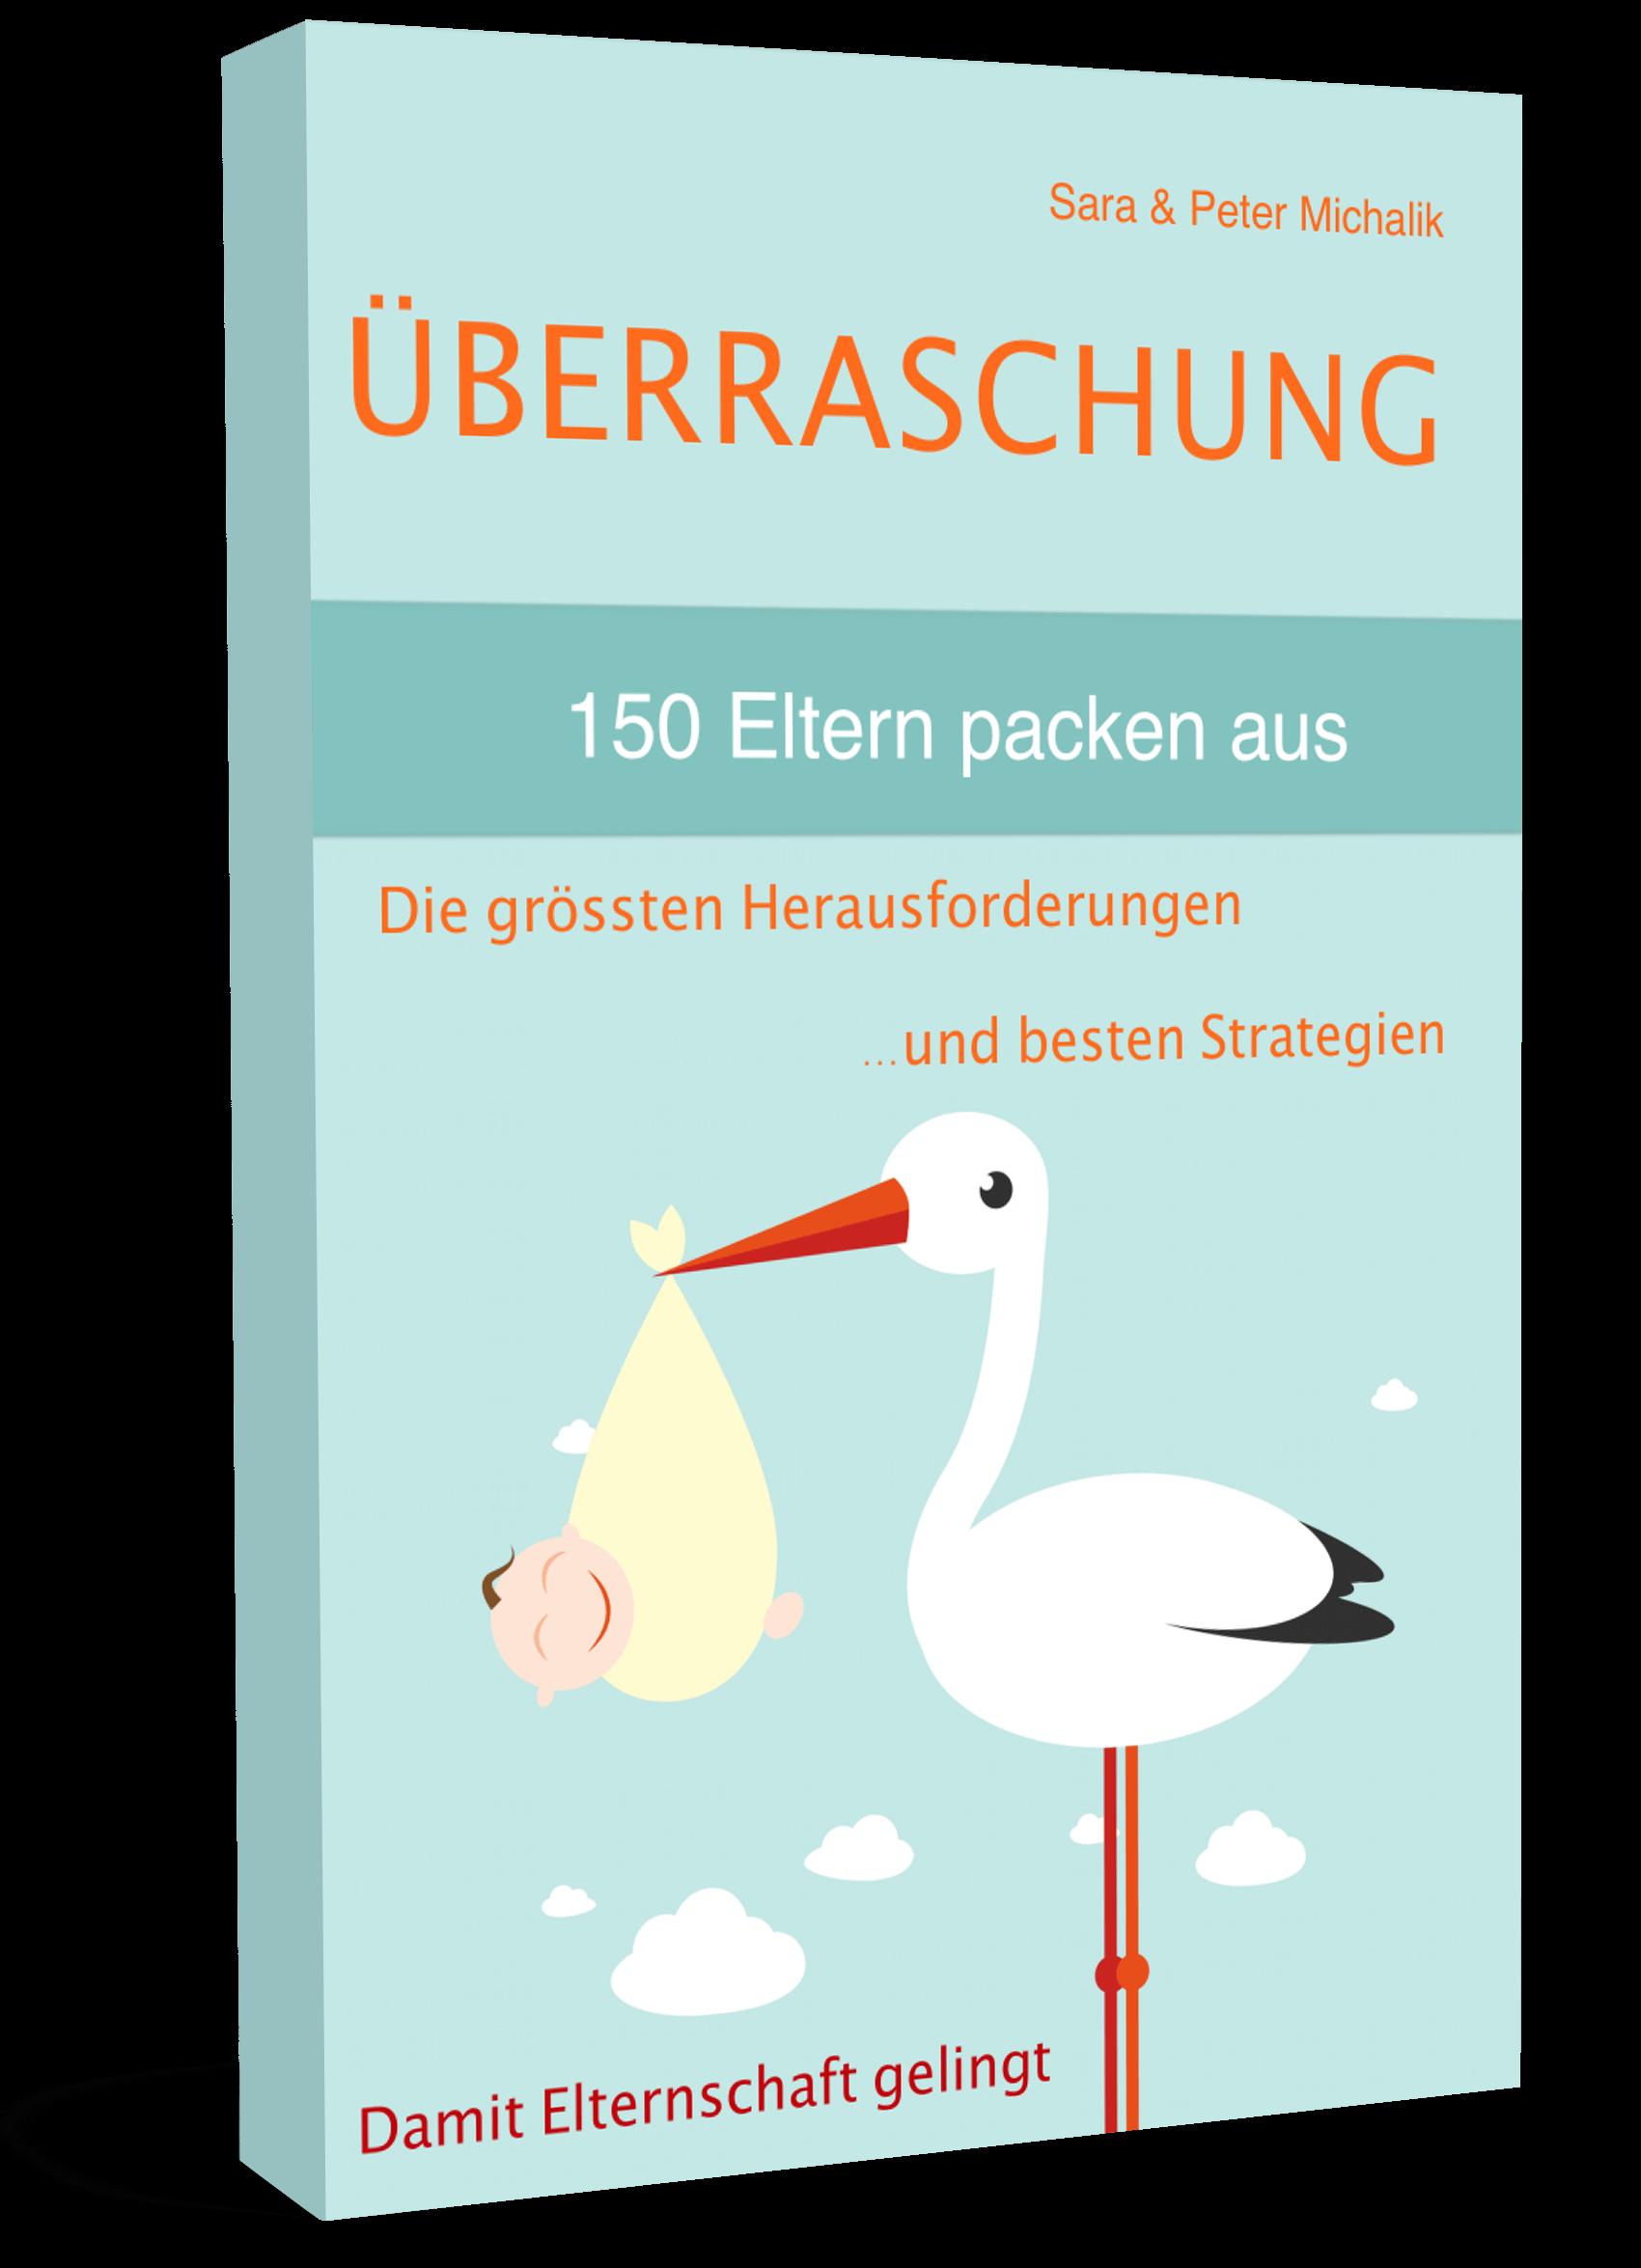 eltern-raten-eltern-3dcover